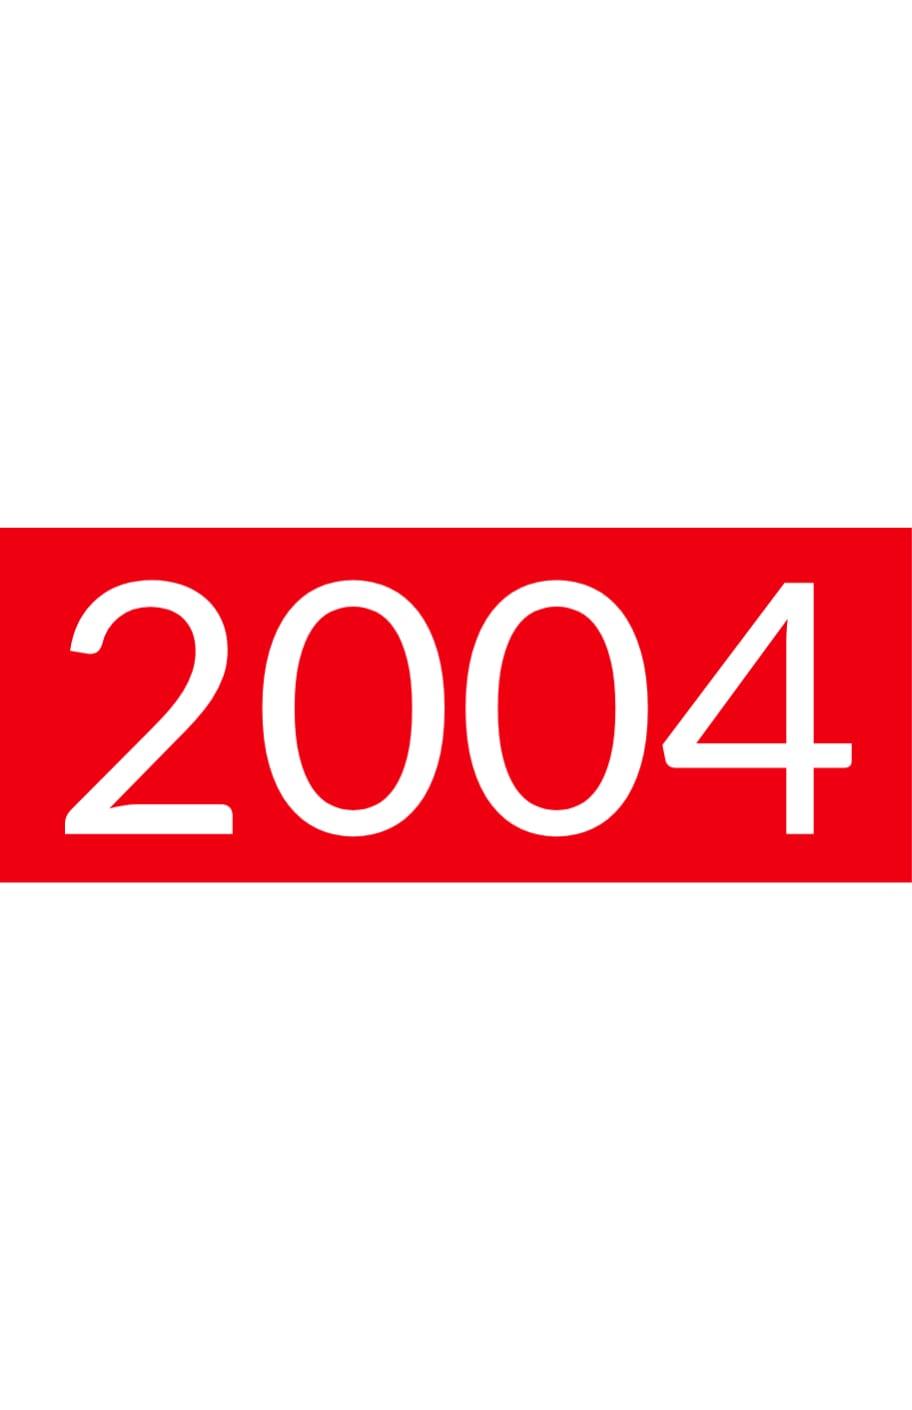 Orange rectangle with white text: 2004